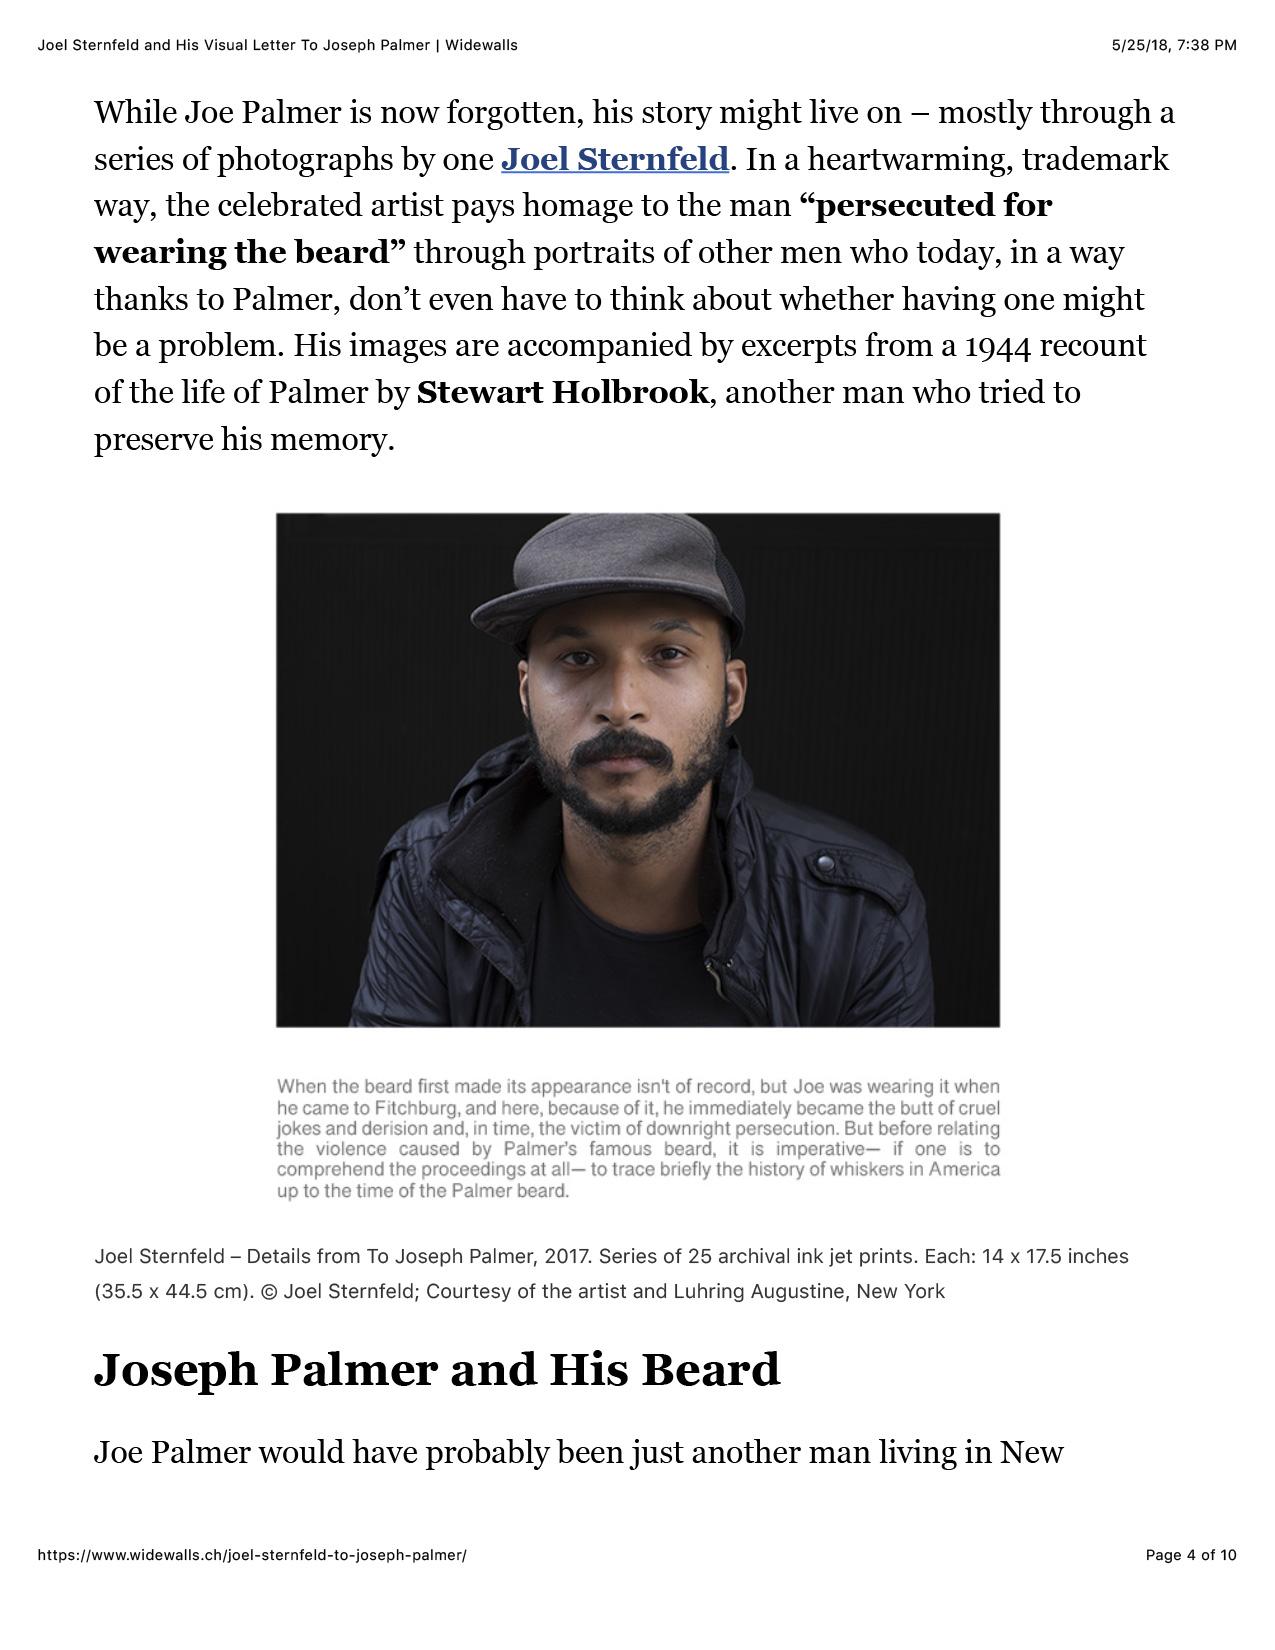 Joel-Sternfeld-and-His-Visual-Letter-To-Joseph-Palmer-_-Widewalls-4.jpg